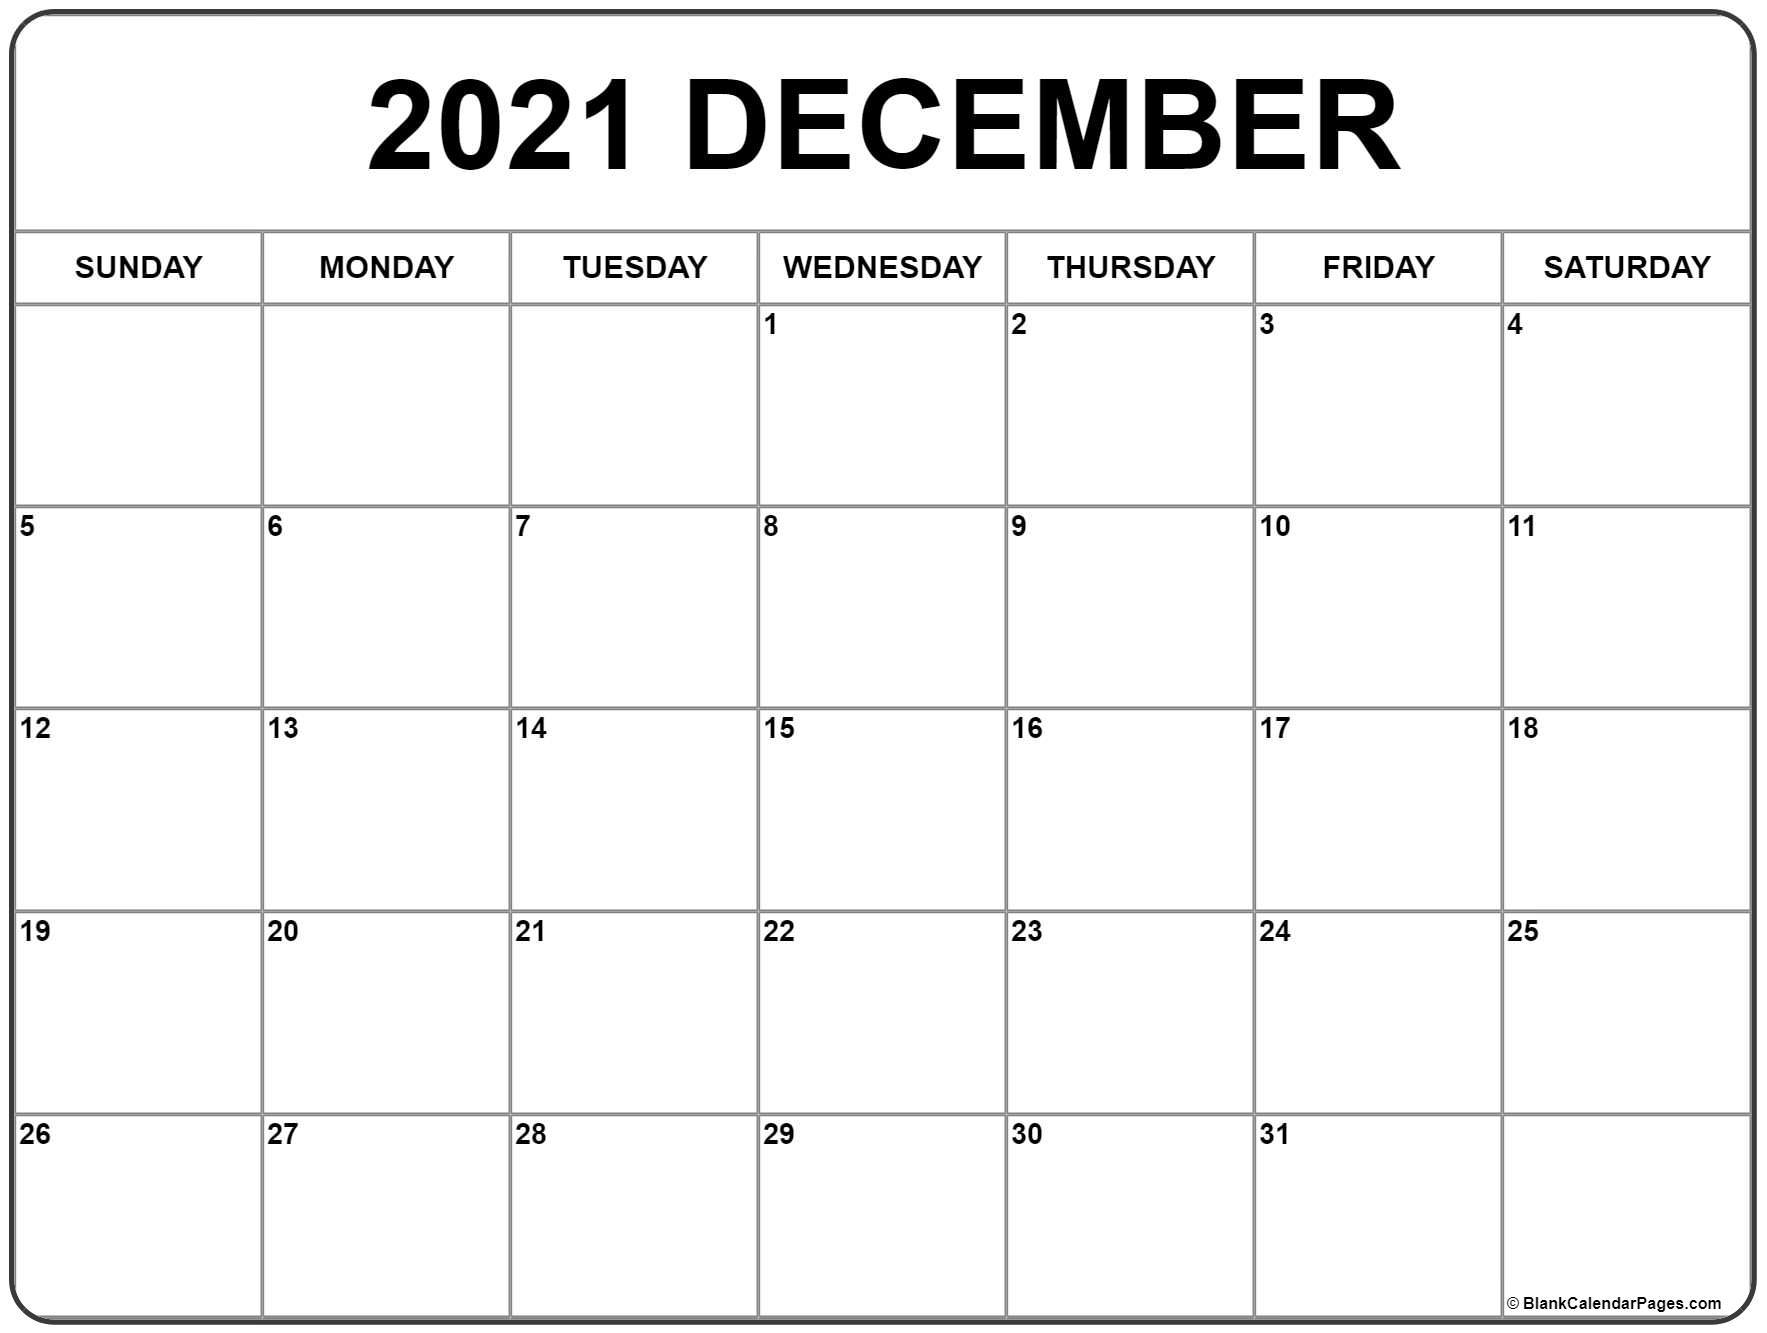 Get Festive November 2021 Calendar Printable